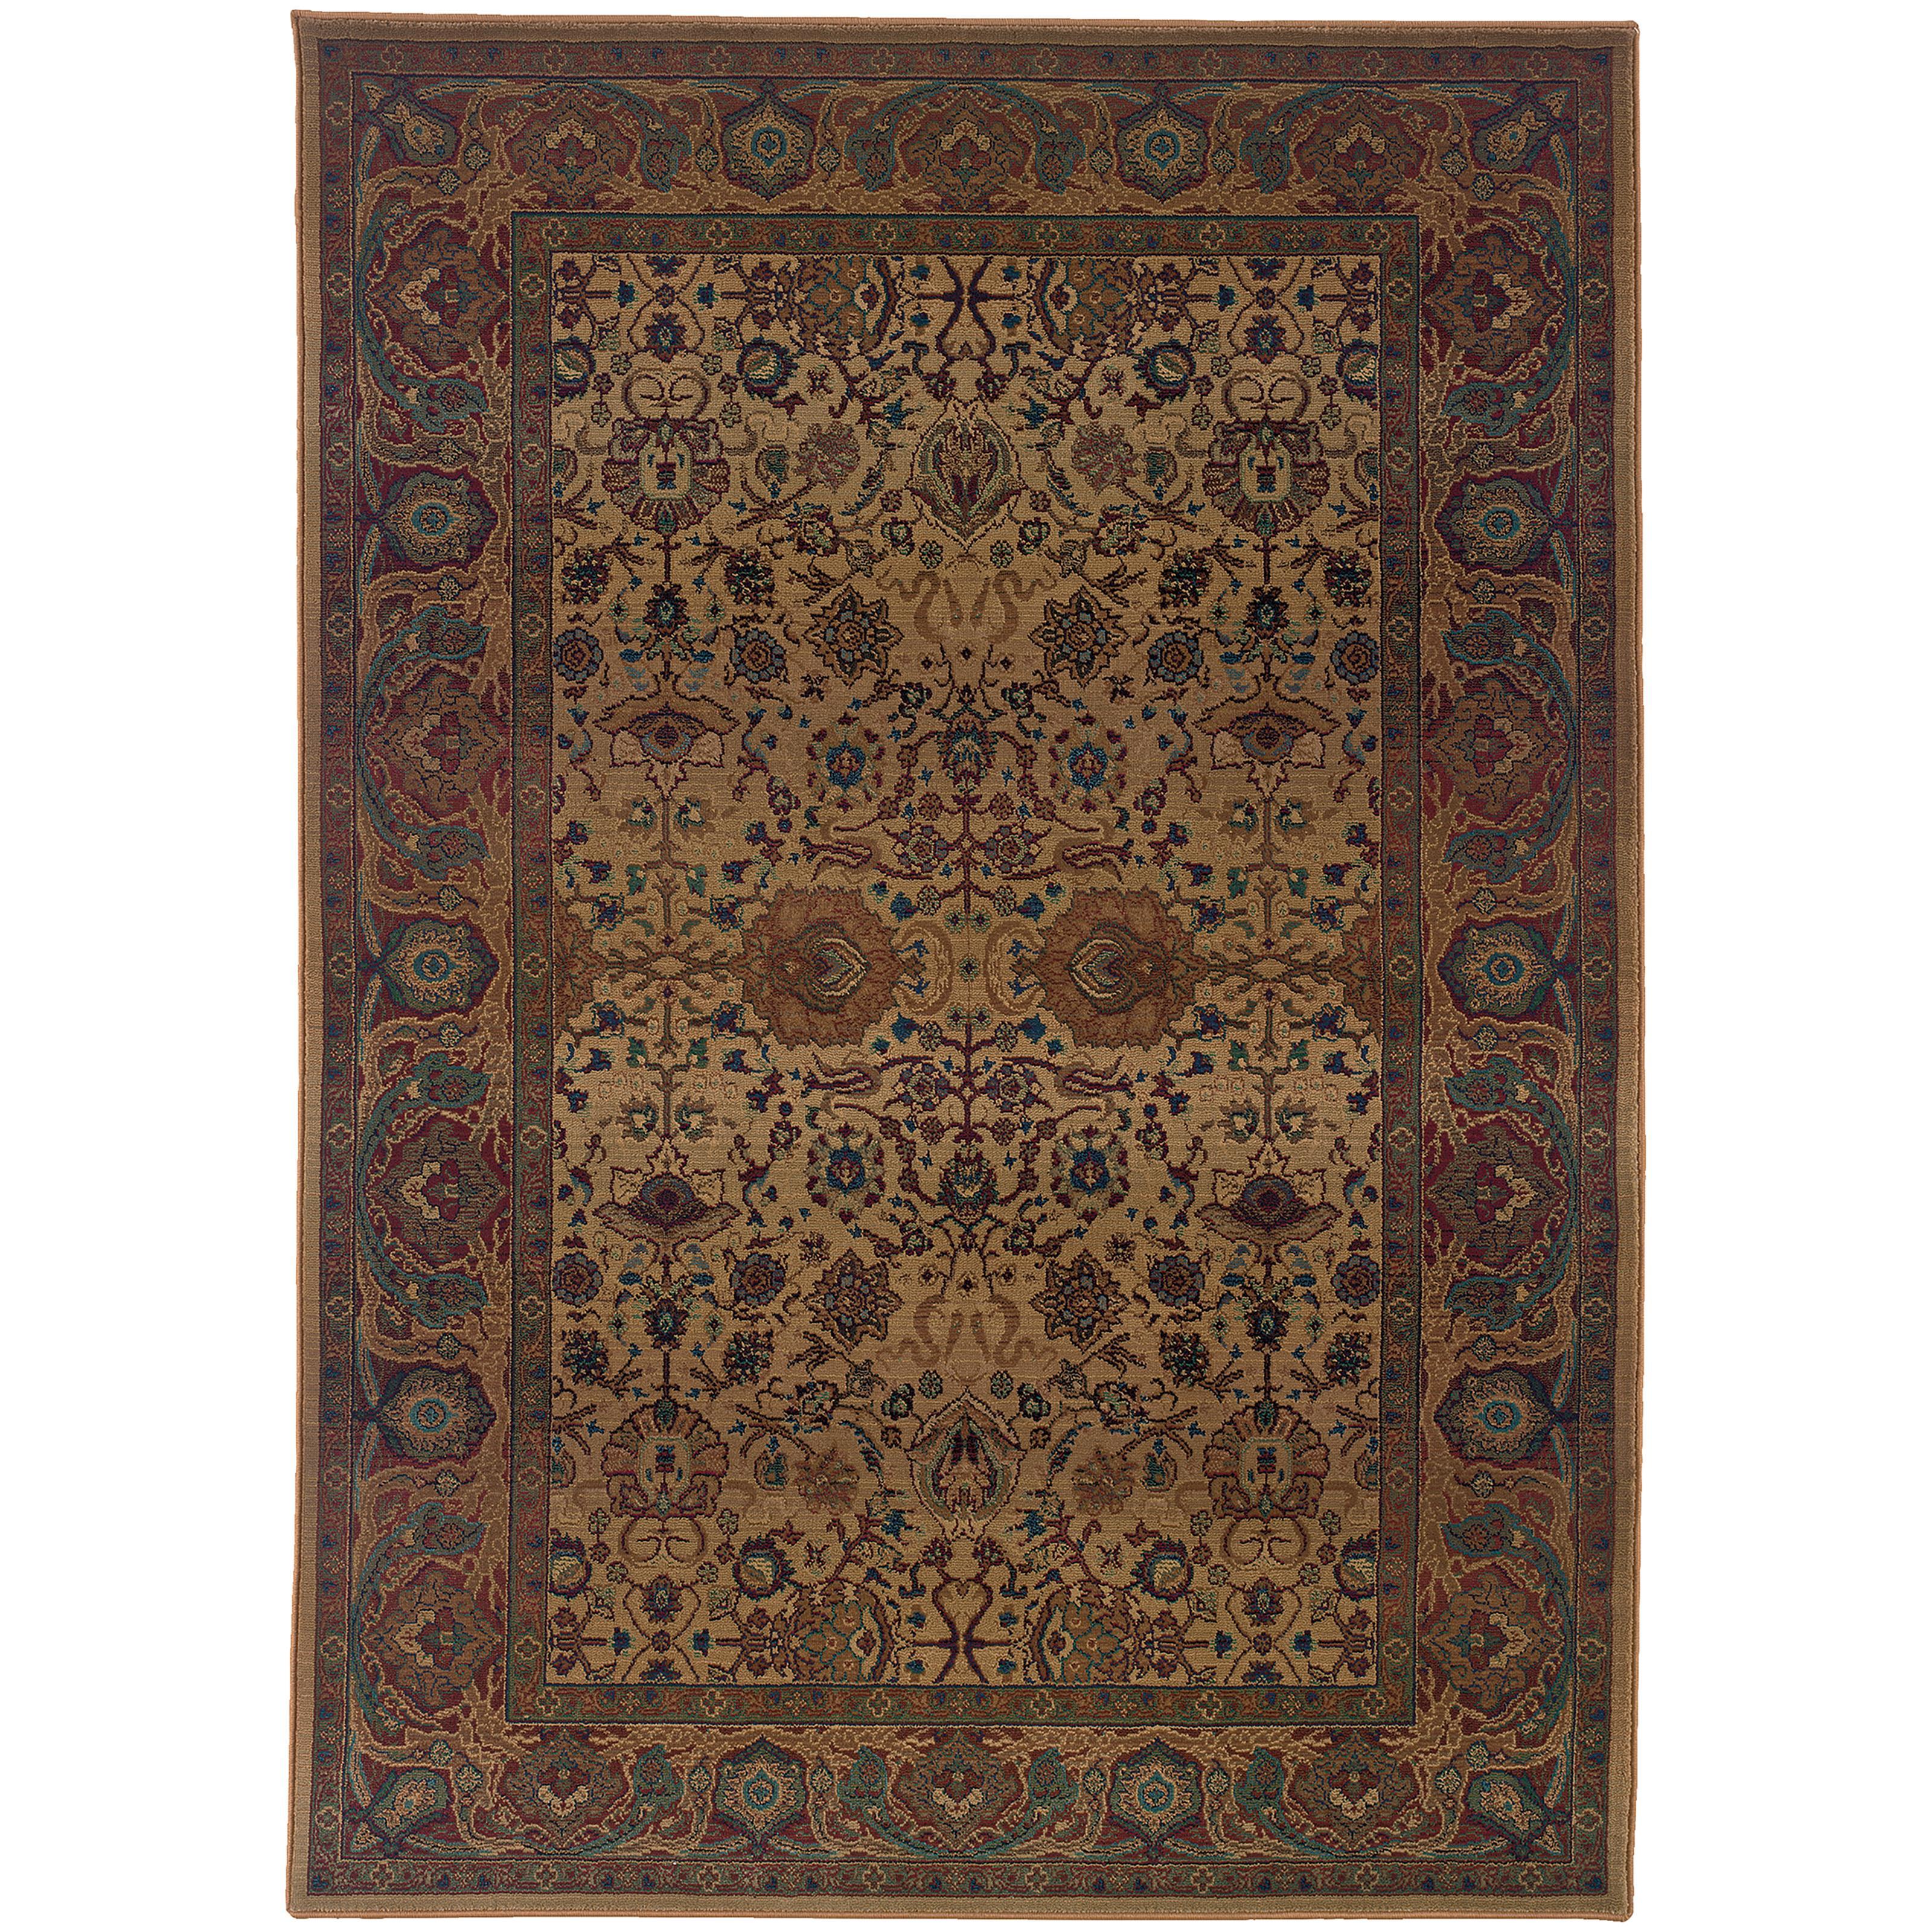 "Kharma 5' 3"" X  7' 6"" Rug by Oriental Weavers at Steger's Furniture"